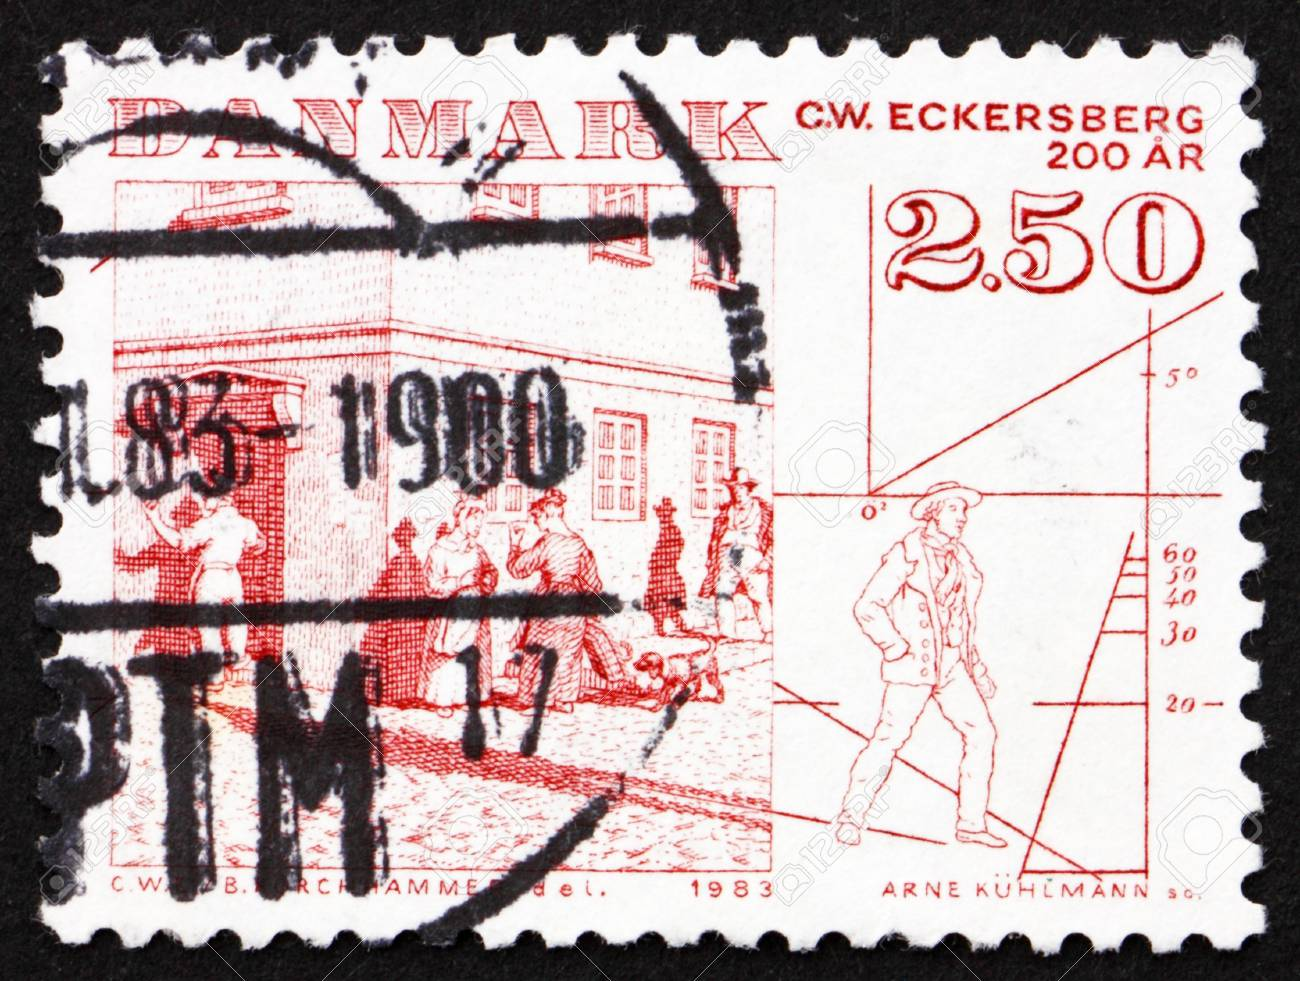 DENMARK - CIRCA 1983: a stamp printed in the Denmark shows Street Scene by C. W. Eckersberg, circa 1983 Stock Photo - 12840006